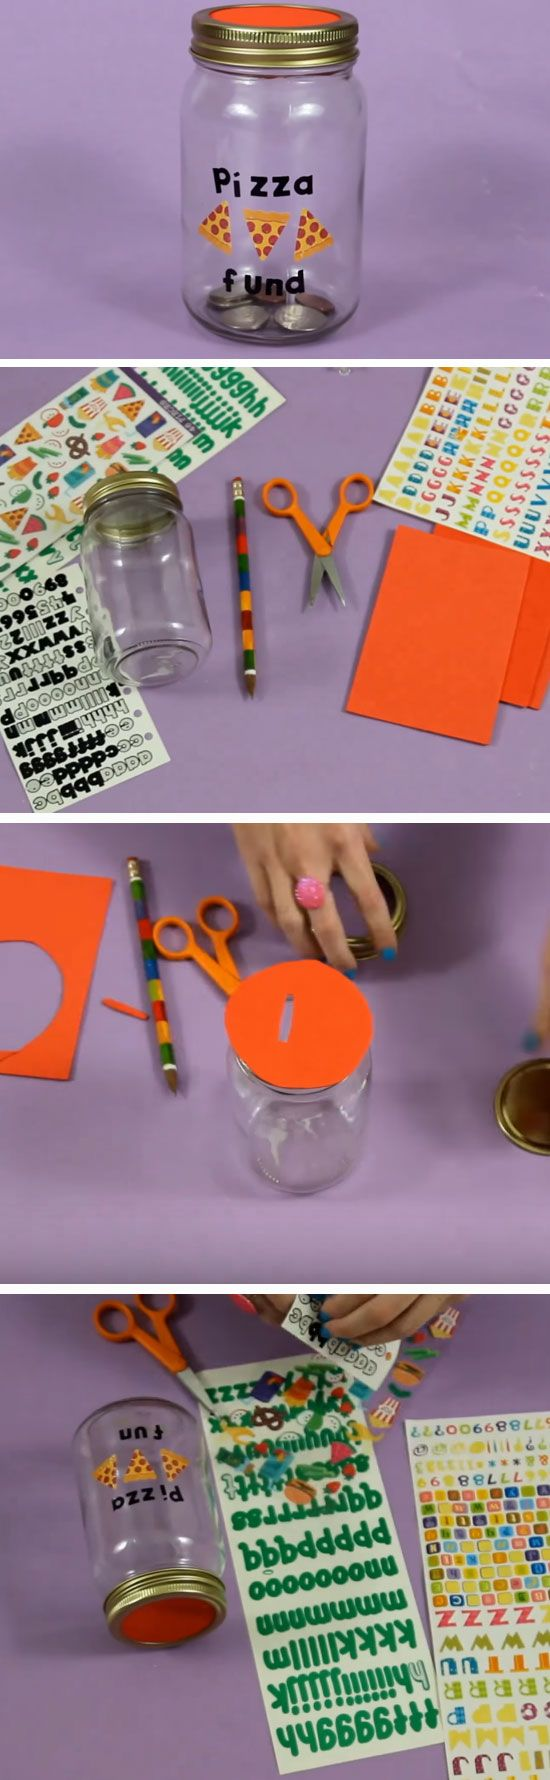 Pizza Fund   DIY Valentines Mason Jar Crafts for Him   Easy Gifts in a Jar Ideas for Boyfriend